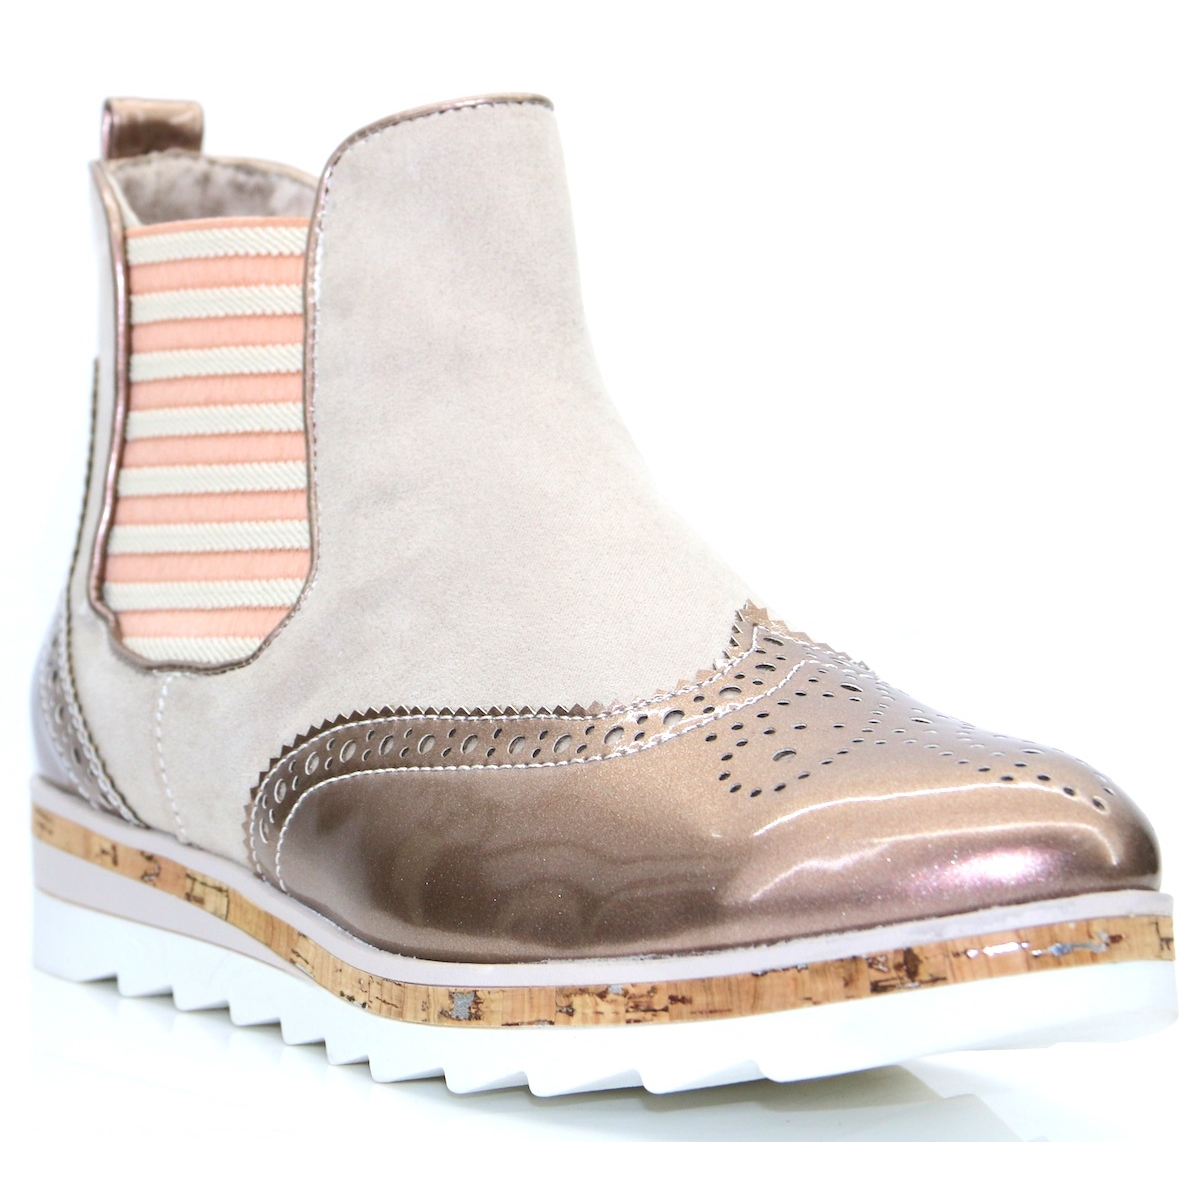 25403 30 marco tozzi rose chelsea boots panache shoe company. Black Bedroom Furniture Sets. Home Design Ideas